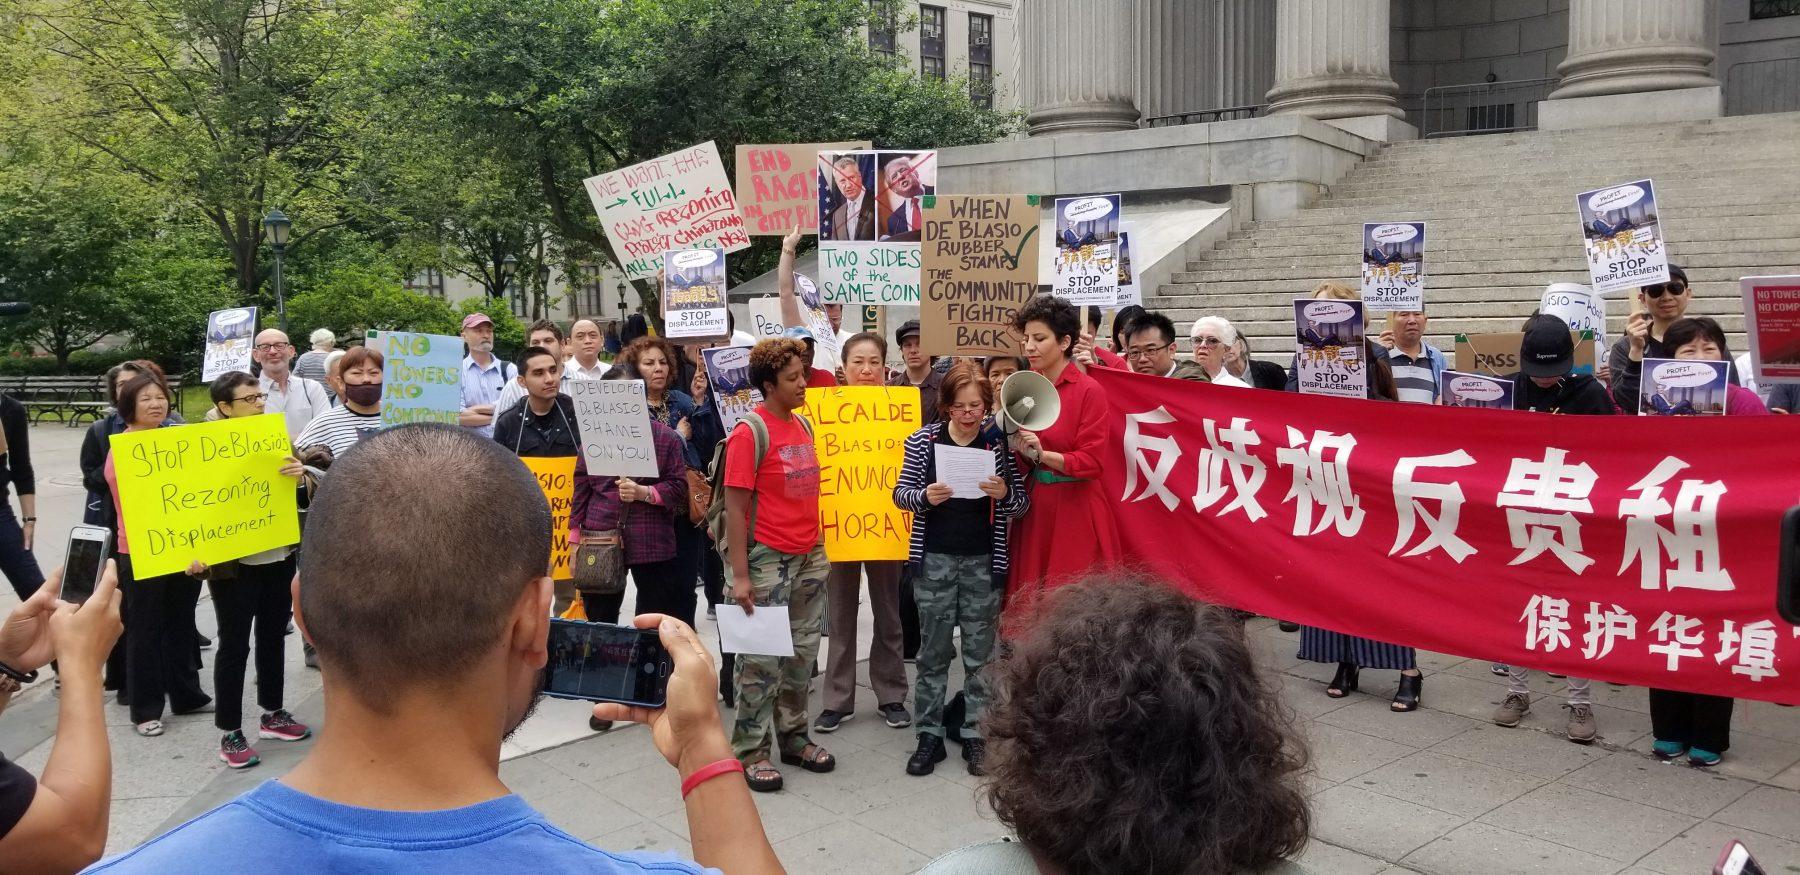 Two Bridges Lawsuit Win for Lower East Side Organized Neighbors